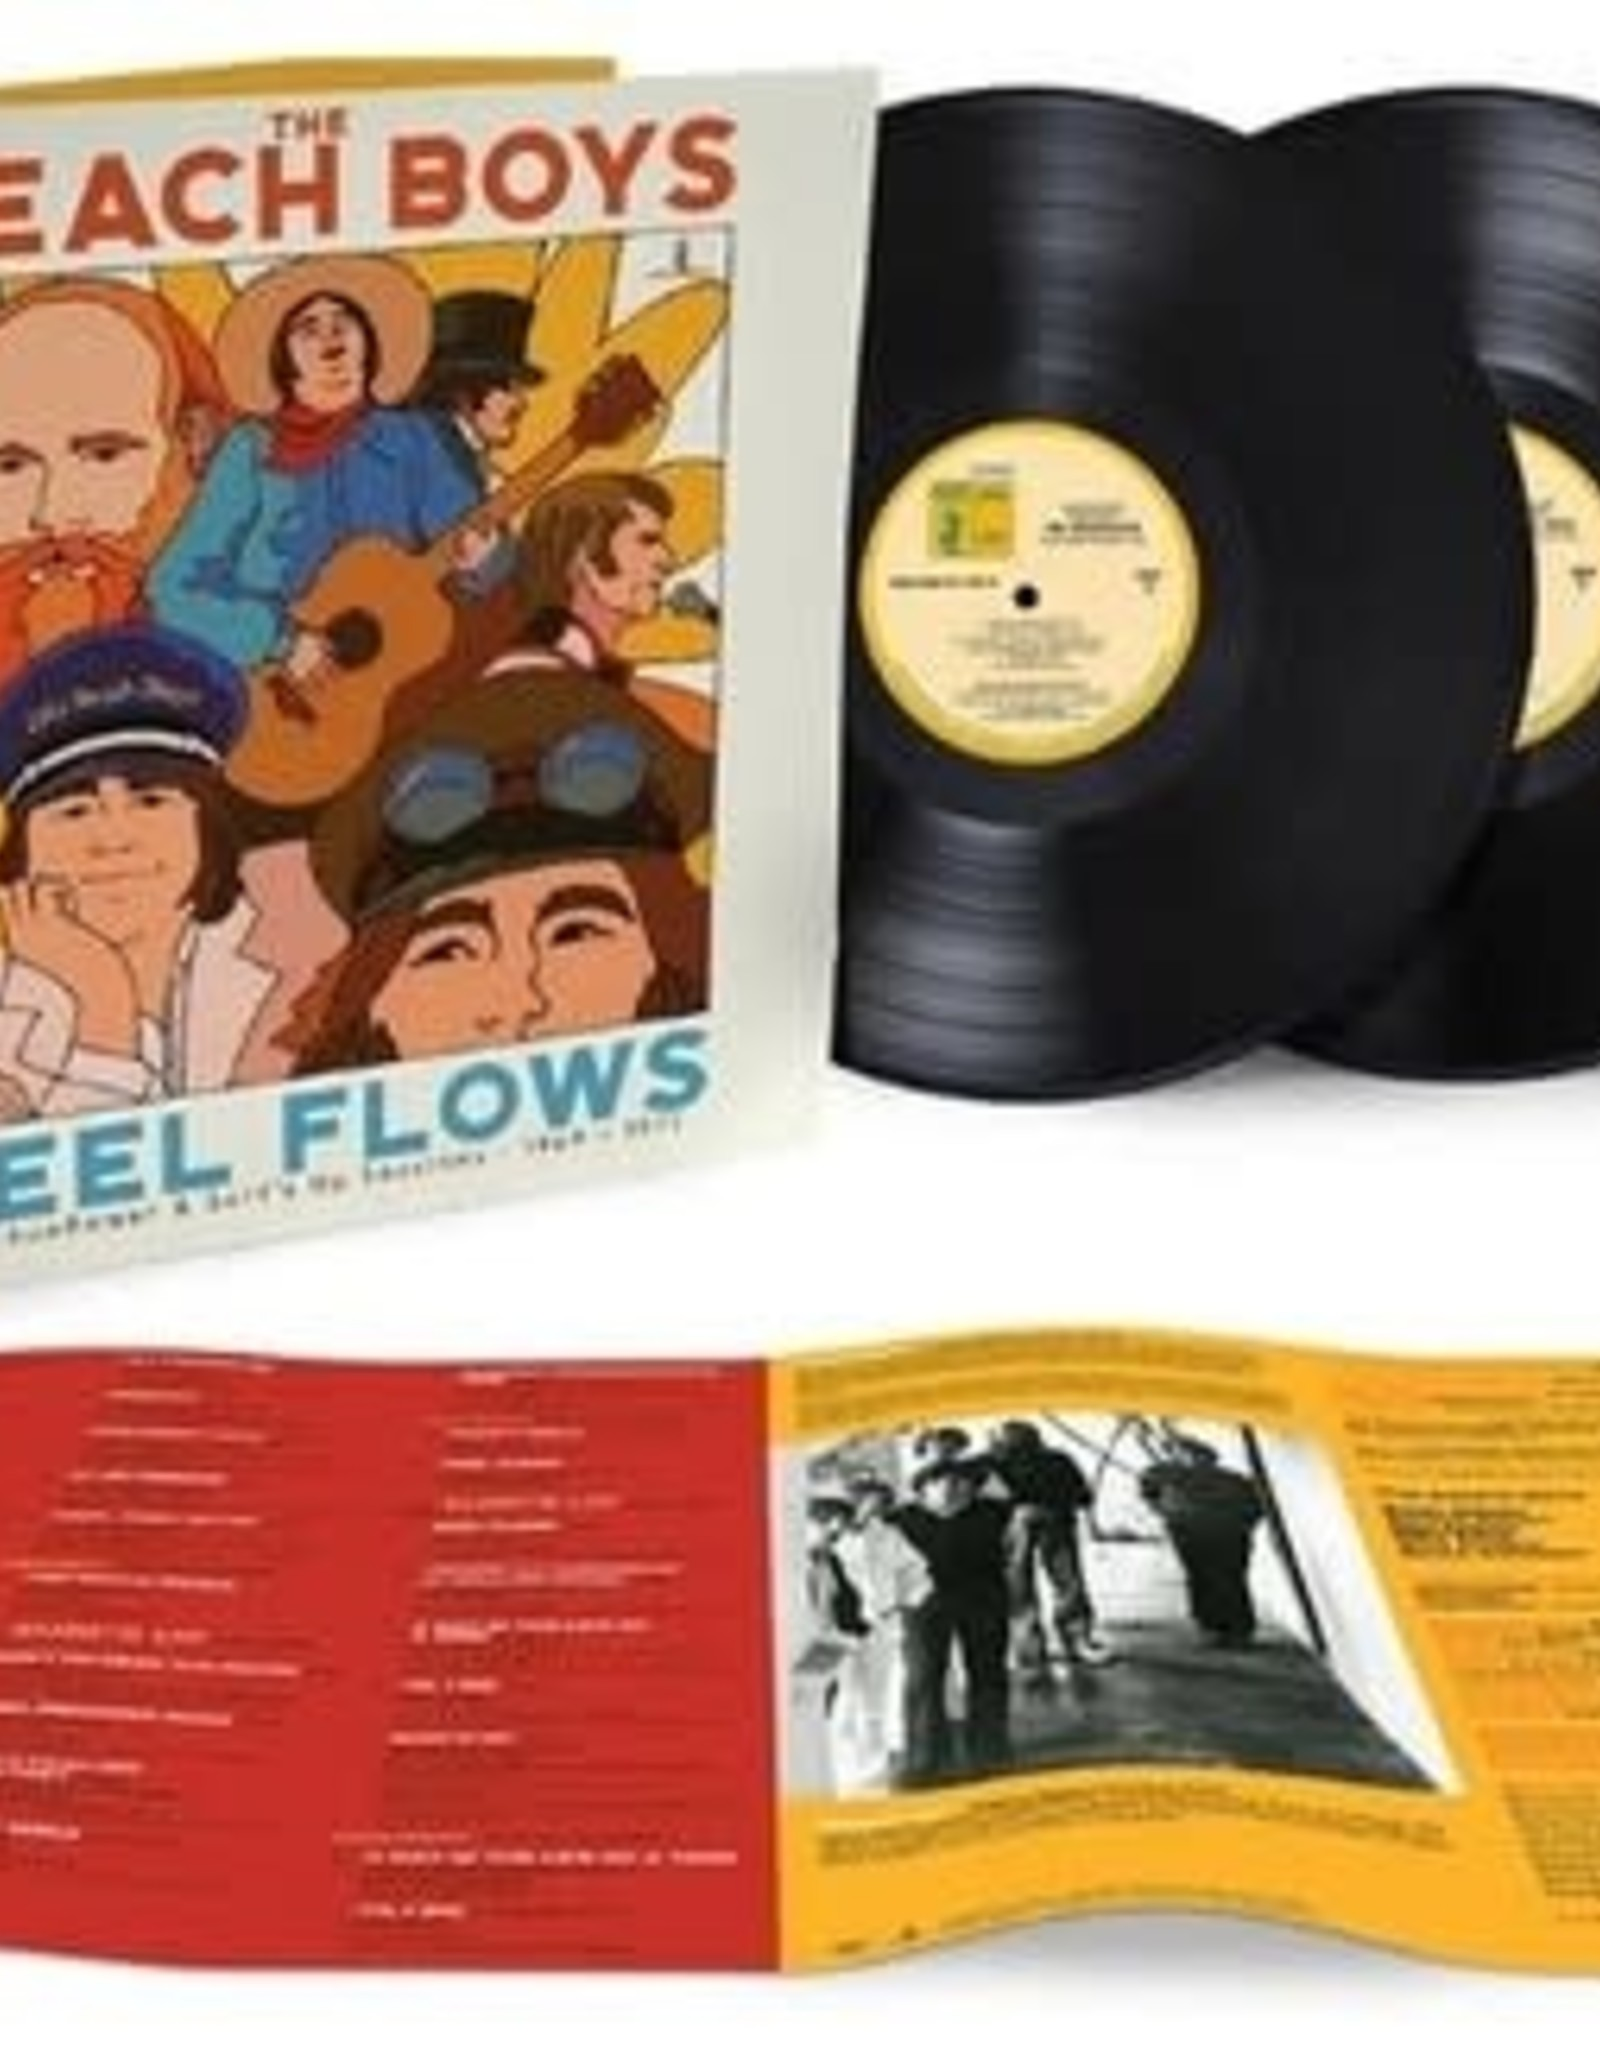 Beach Boys - Feel Flows The Sunflower & Surf's Up Sessions 1969-1971